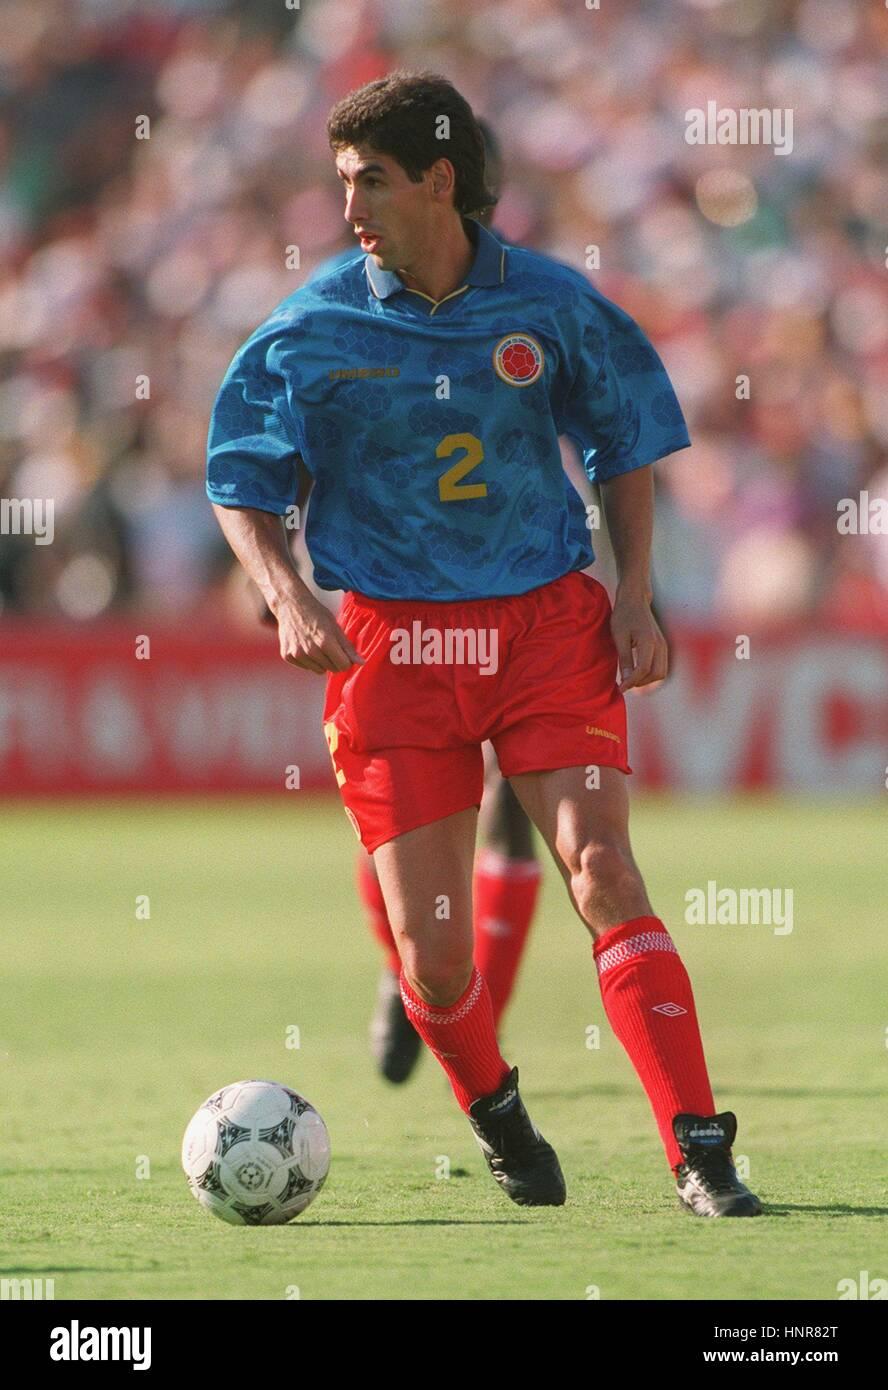 6073c043719 Andres Escobar Stock Photos & Andres Escobar Stock Images - Alamy